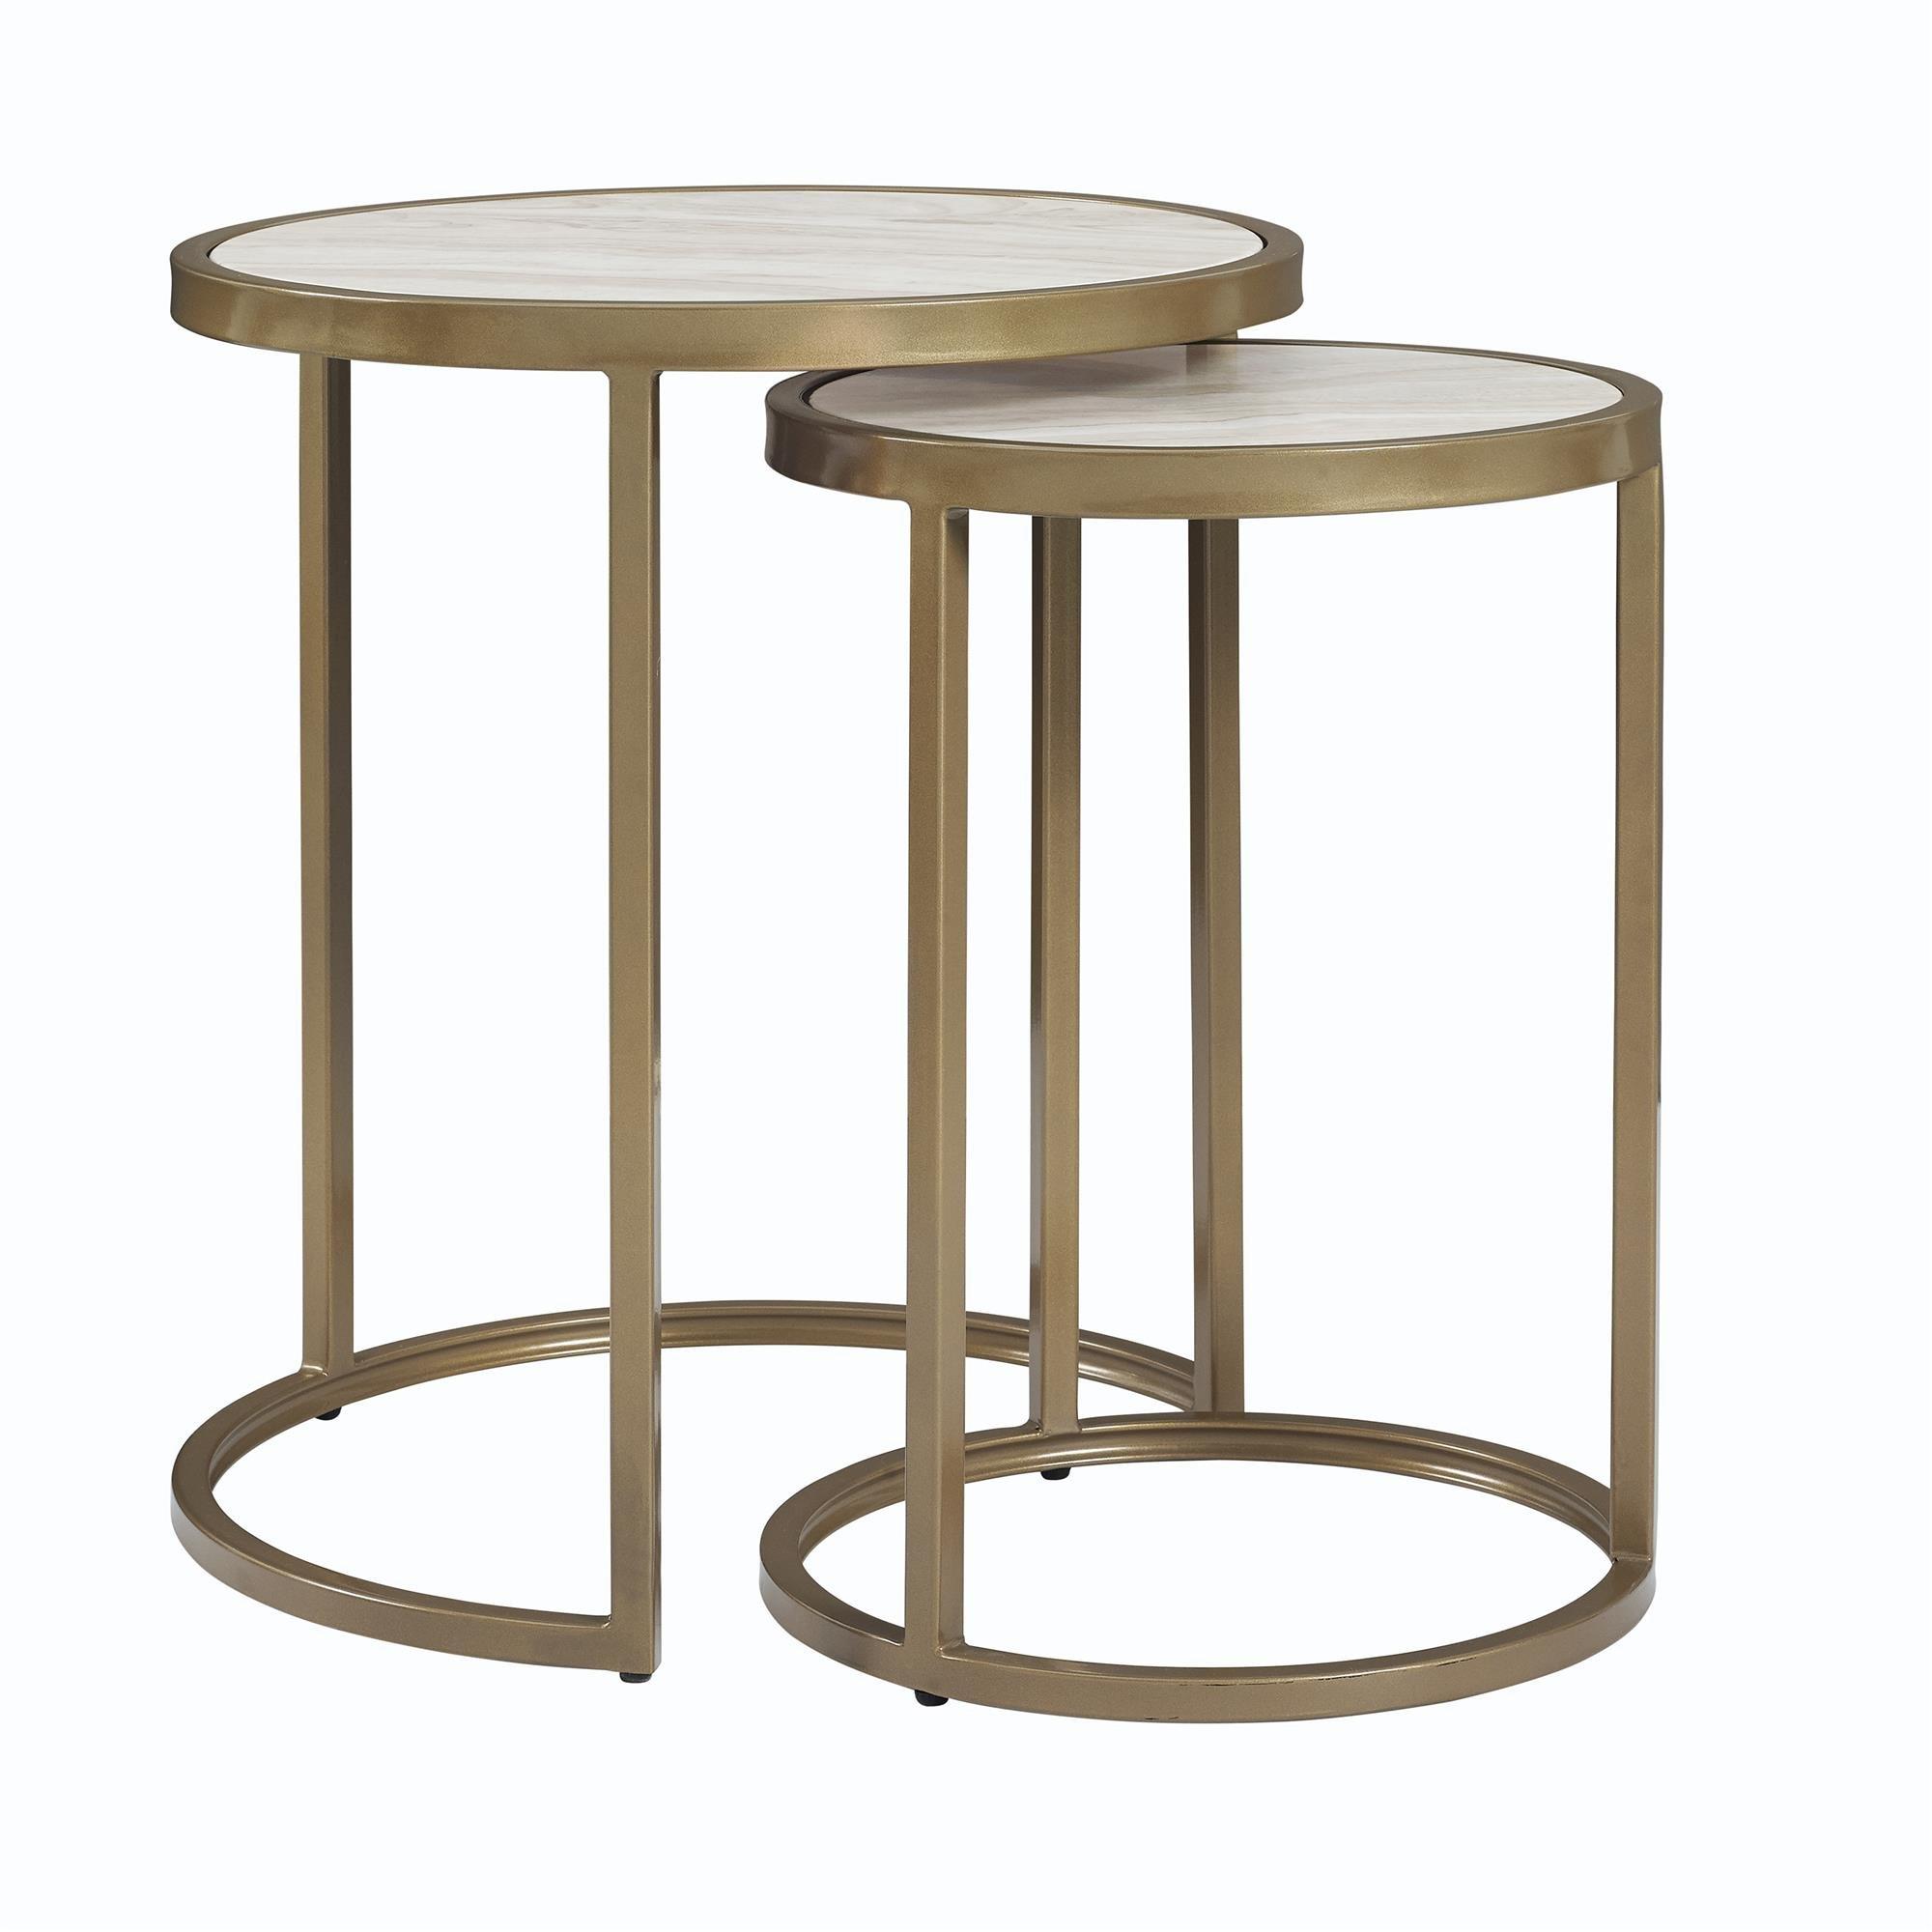 Dorel Living Moriah Nesting Tables, Soft Brass, Faux Marble by Dorel Living